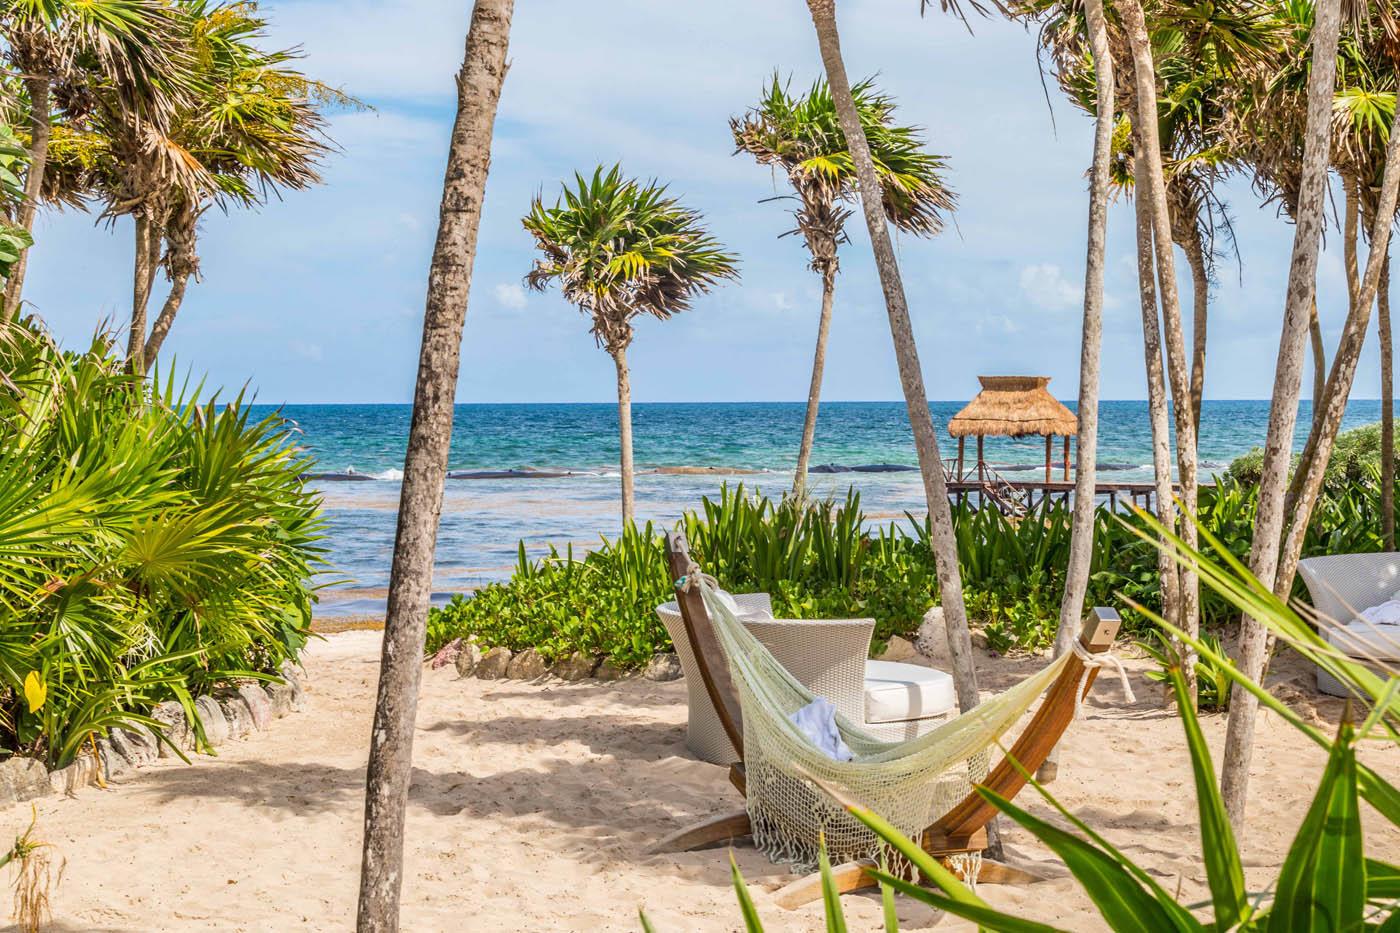 Christopher P. Coyne - Beach Solitude